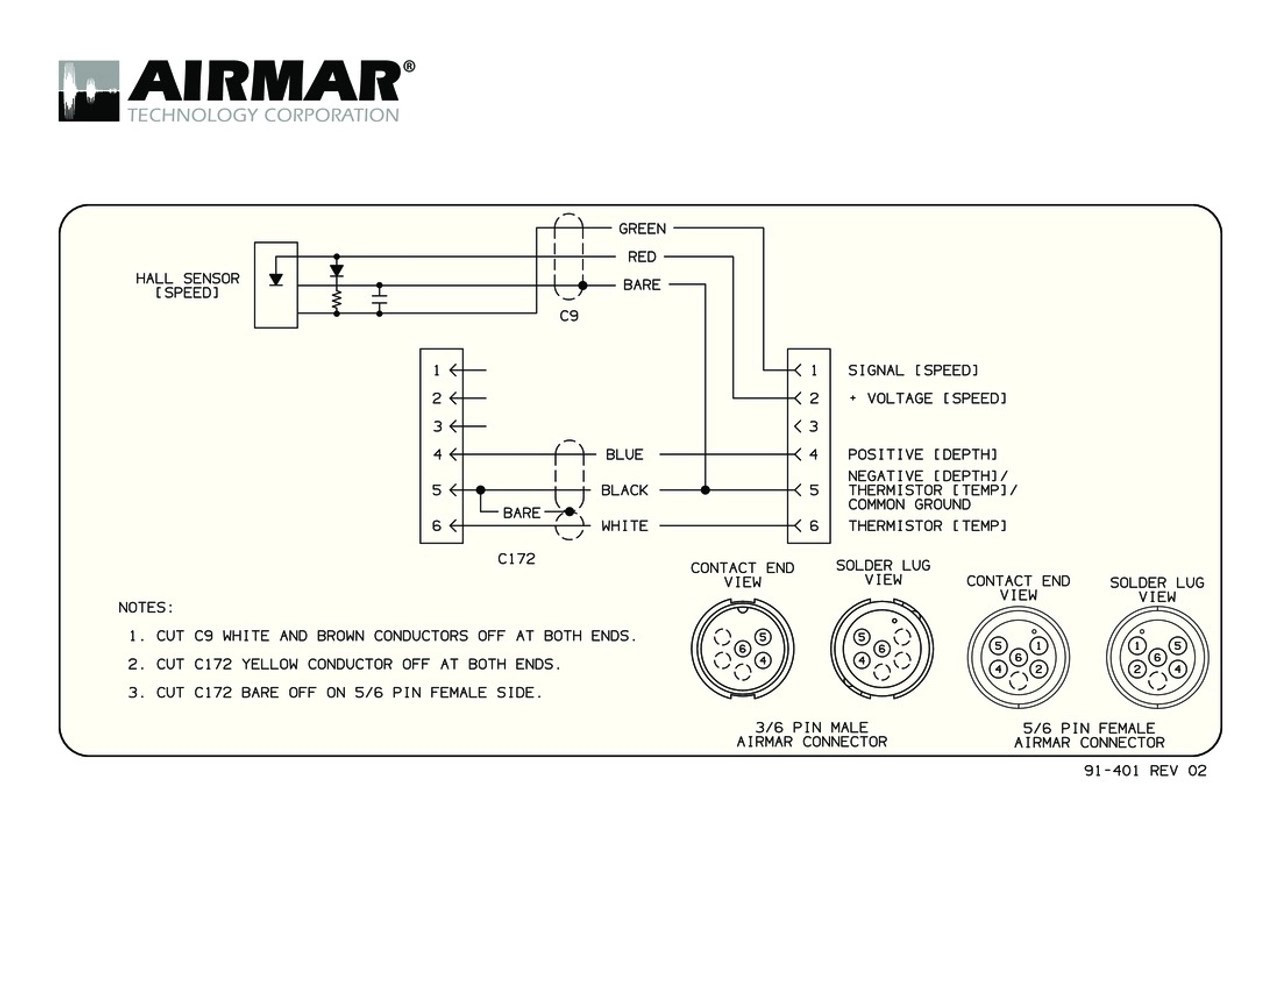 hight resolution of airmar wiring diagram garmin 6 pin s blue bottle marine transducer wiring diagram transducer wiring diagram